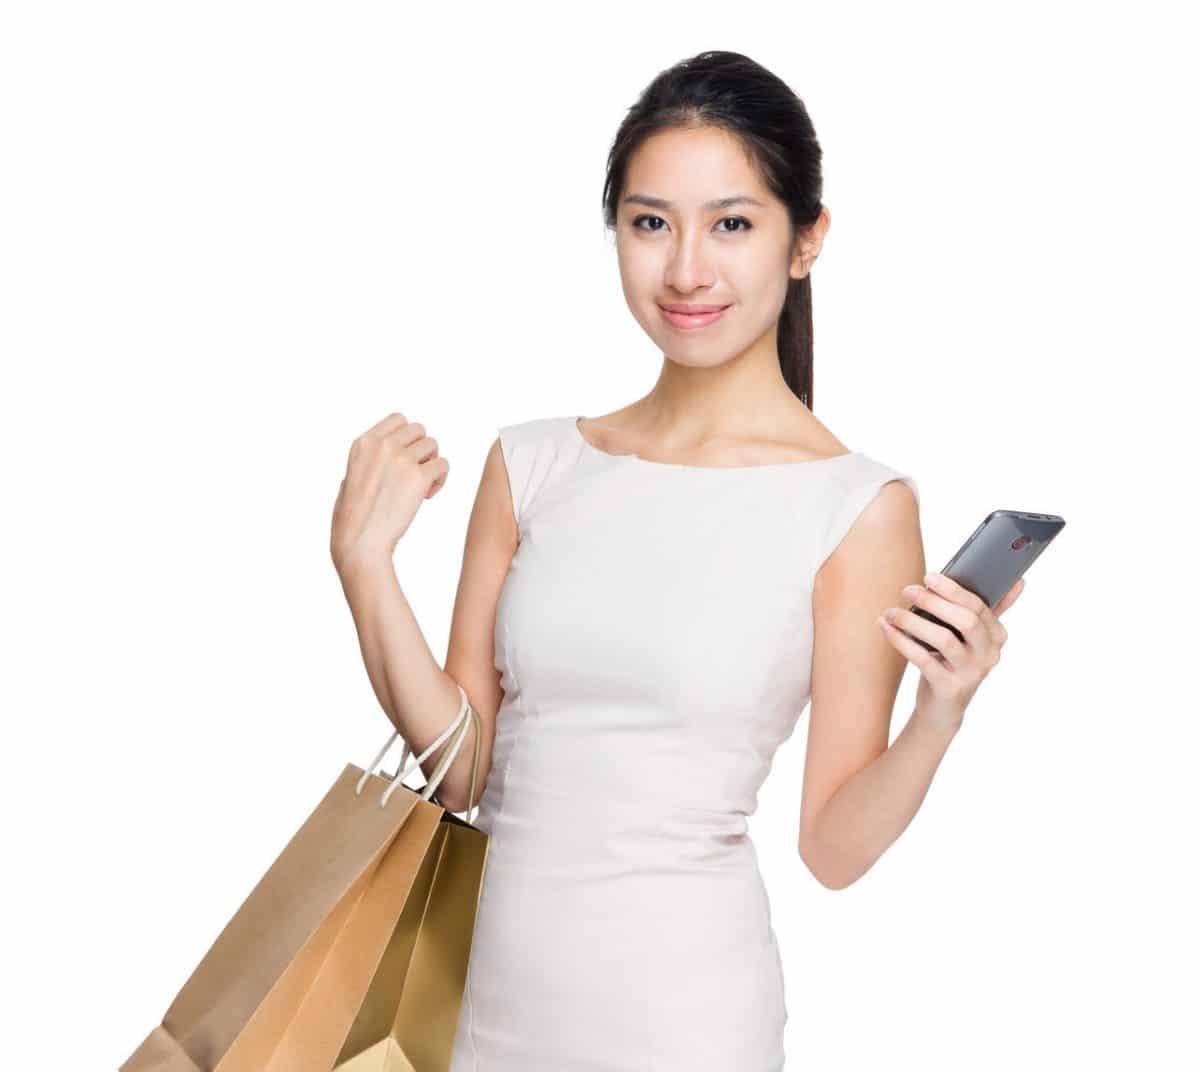 mobile app developer in singapore